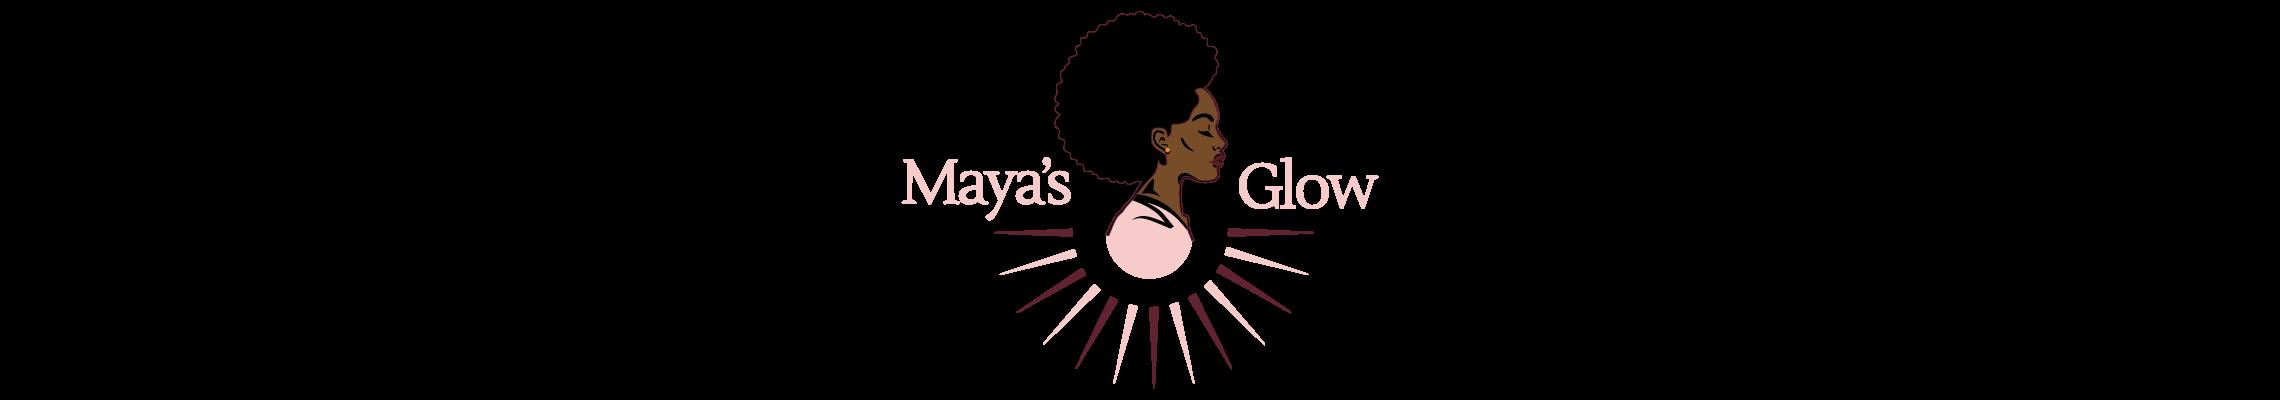 Maya's Glow